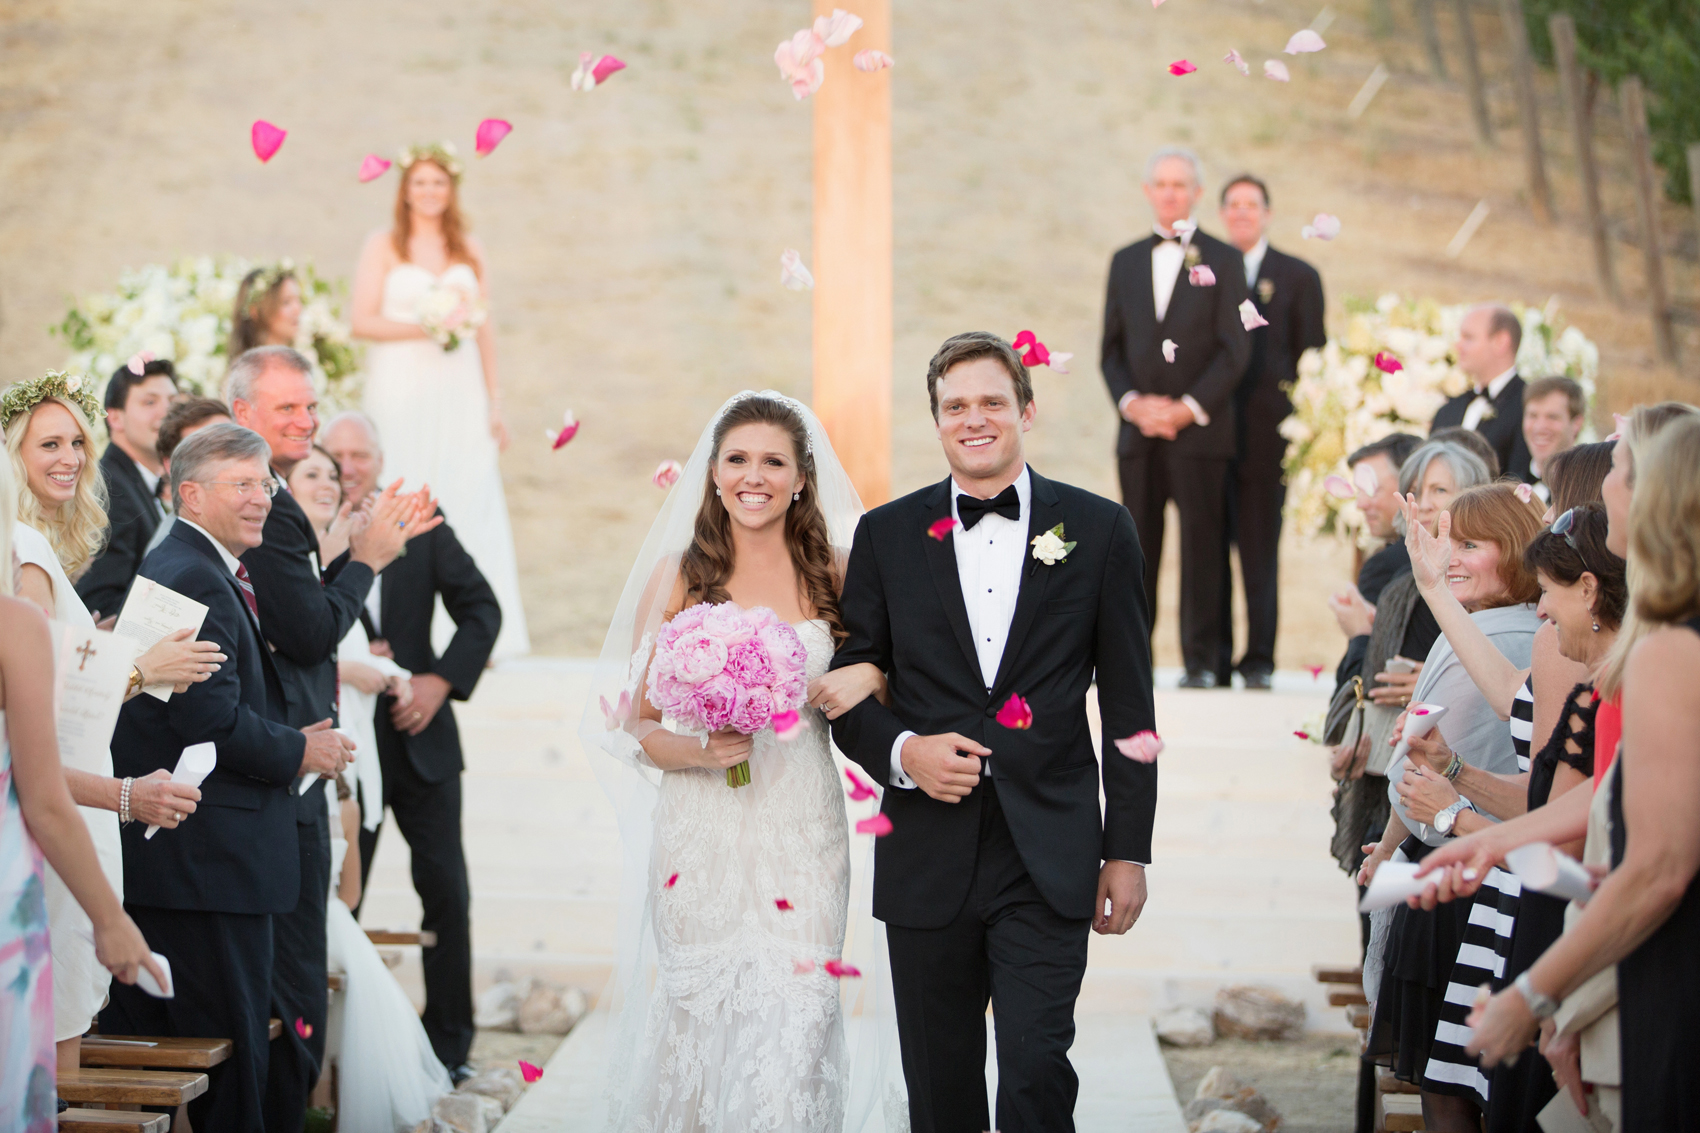 Bride and groom walking down the aisle flower petal toss